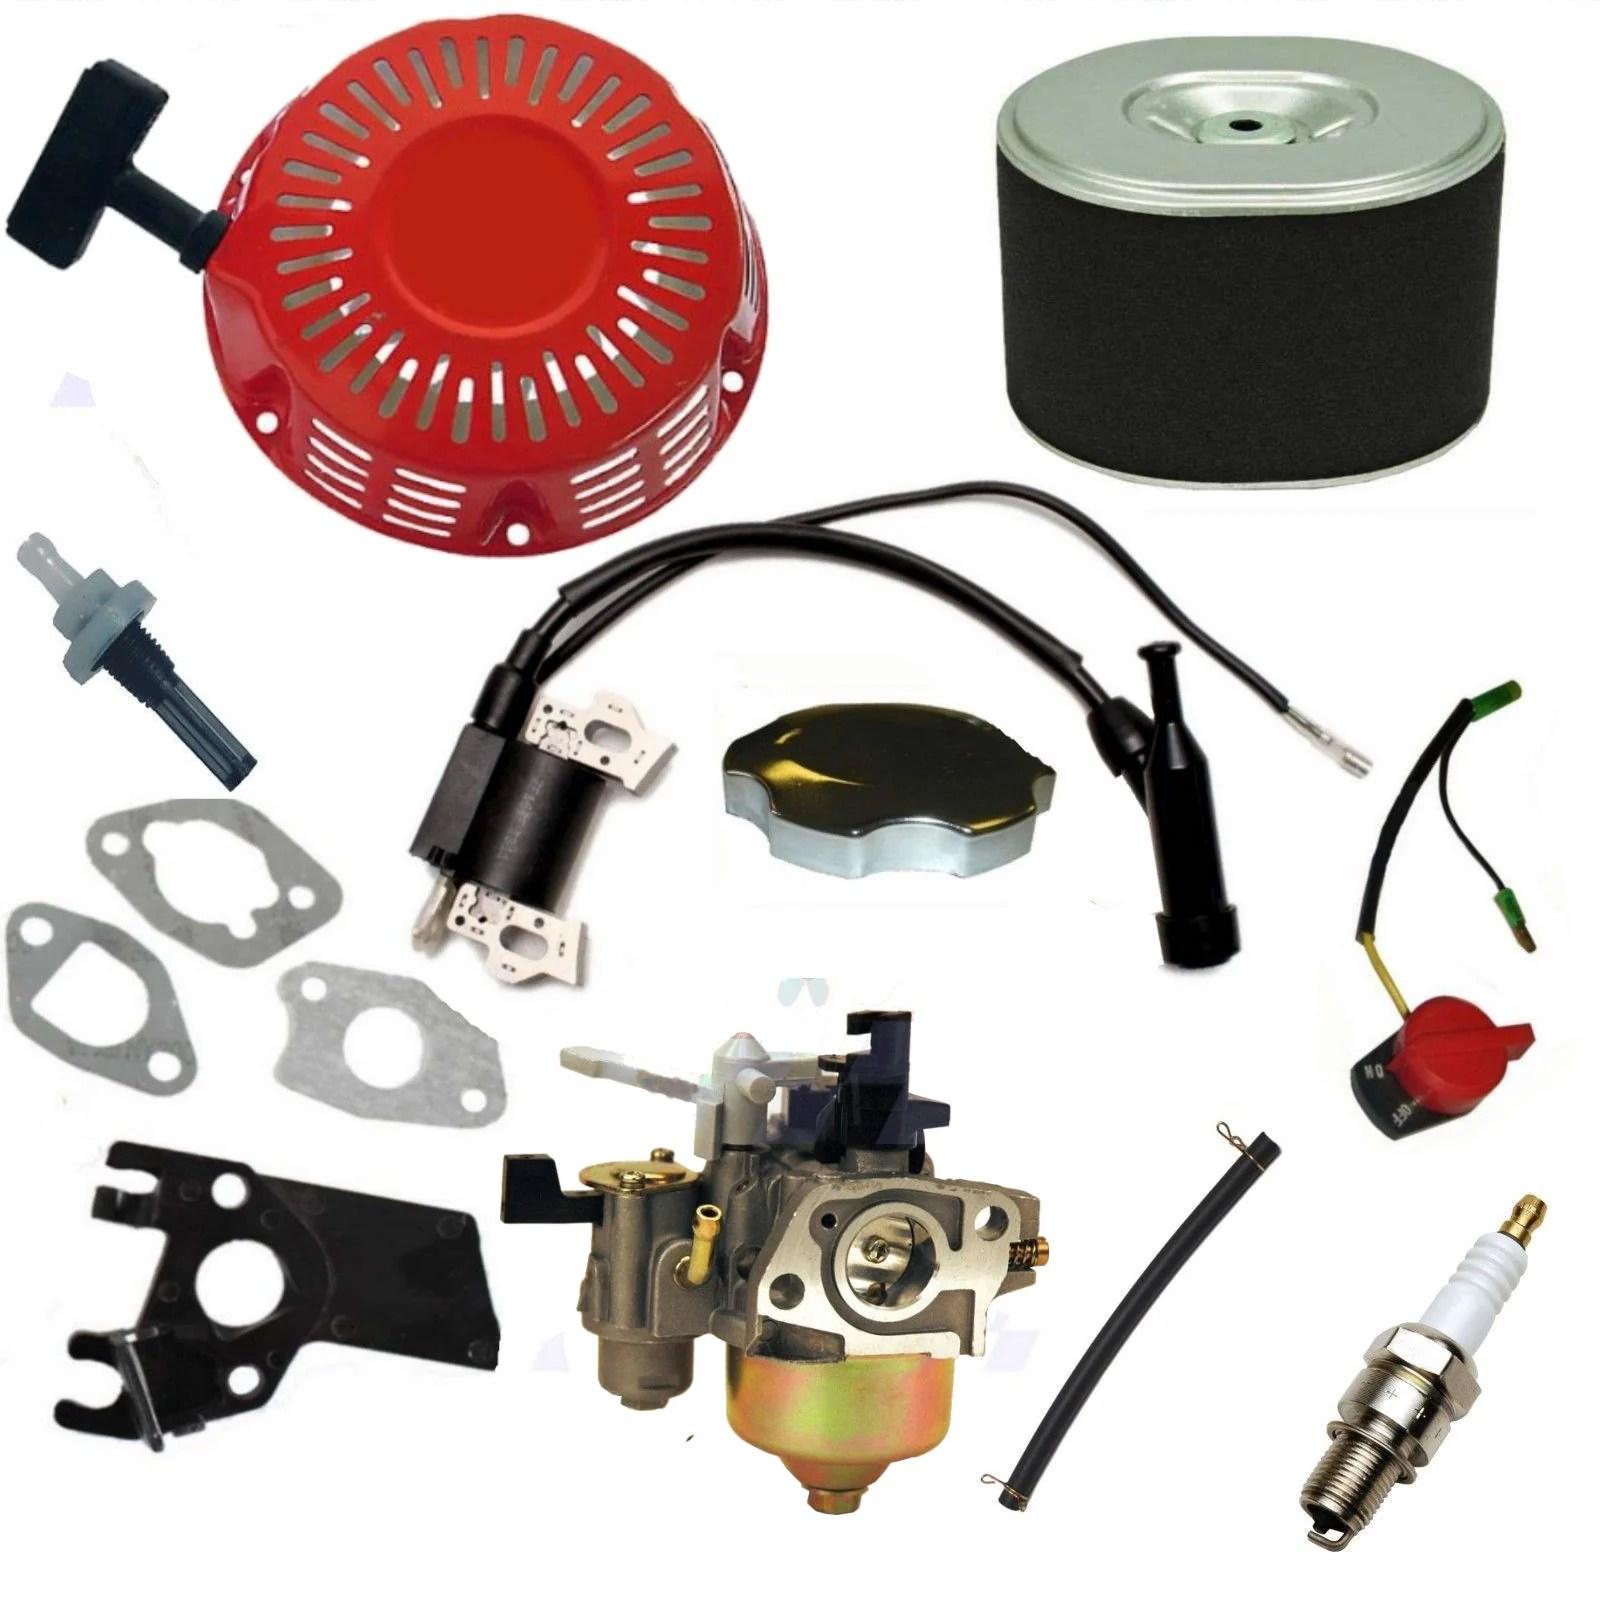 hight resolution of new honda gx390 recoil carburetor ignition coil spark plug air honda gx390 solenoid honda gx390 wiring plug